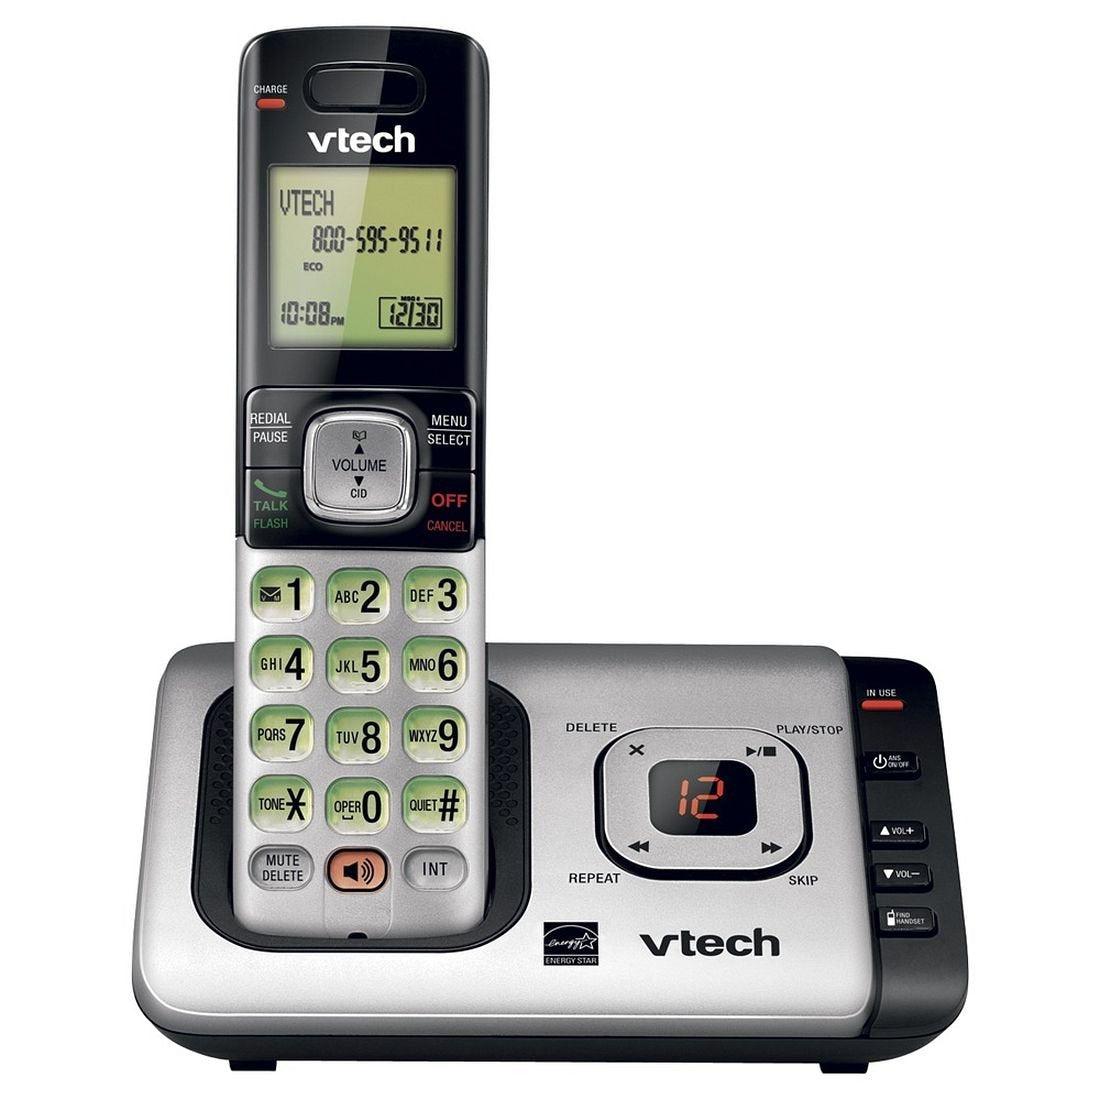 Vtech Cs6729 Cordless Phone & Answering Machine System, Gray